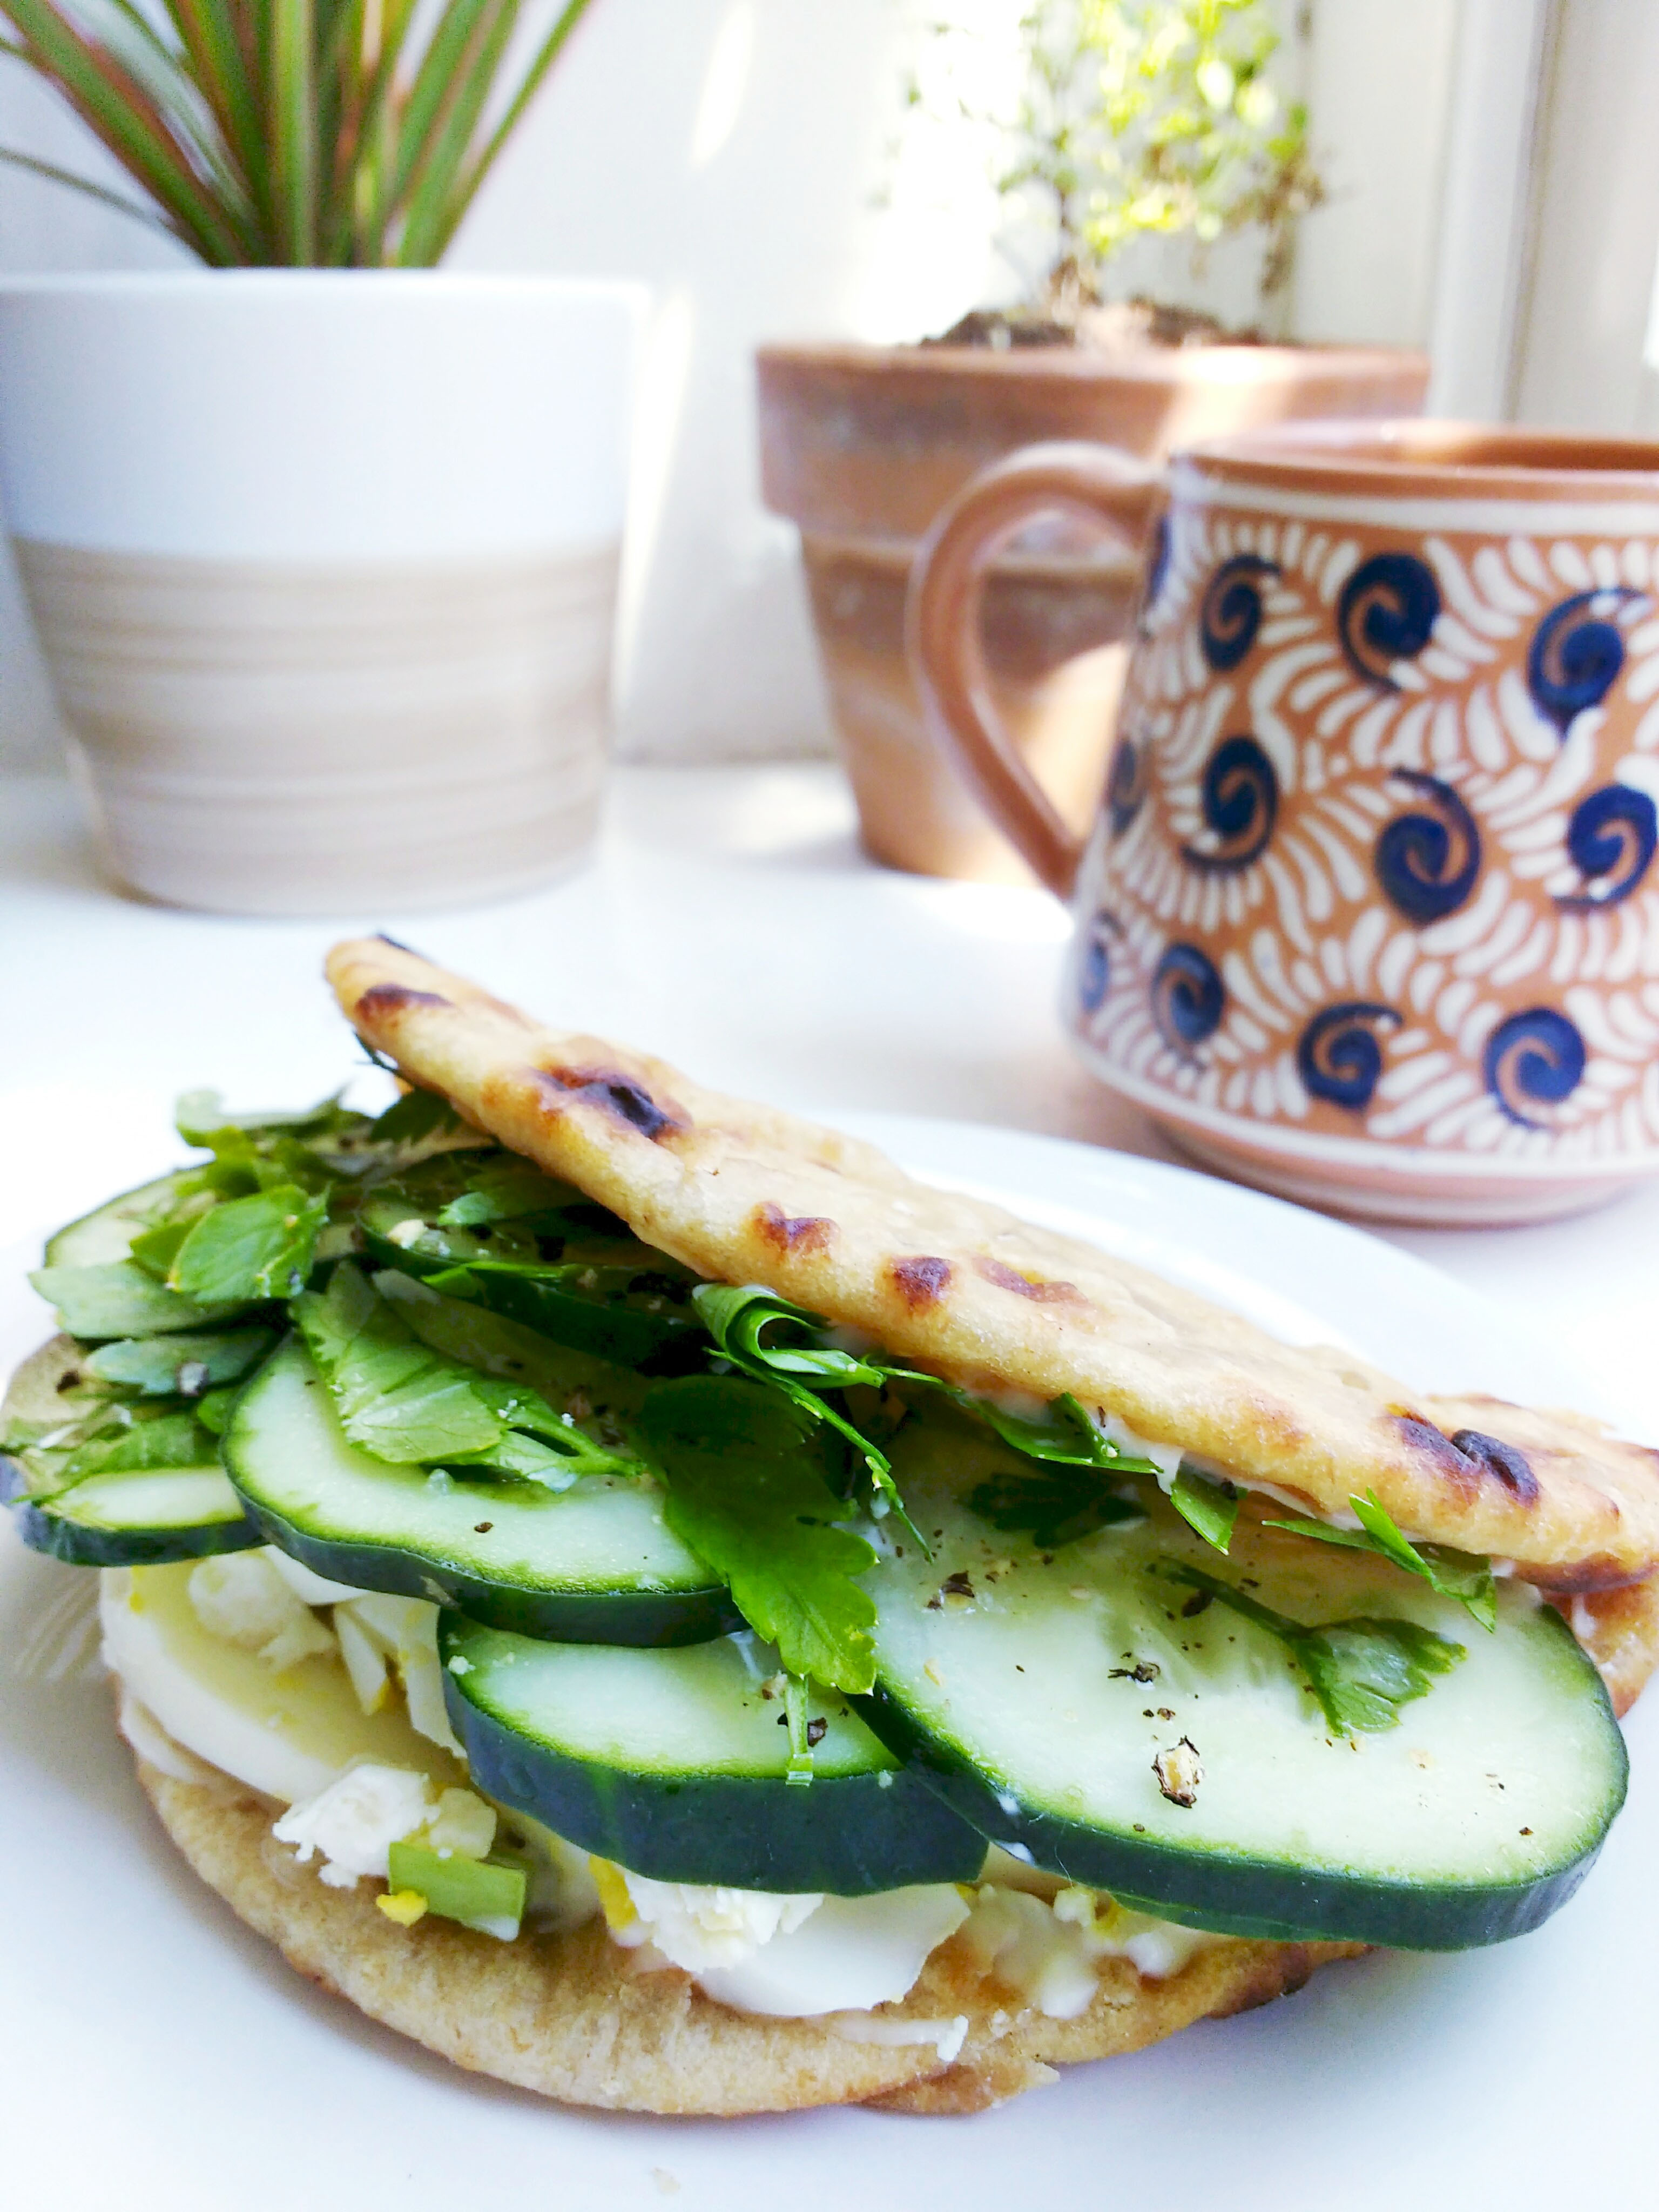 Turkish Inspired Egg Salad Sandwich